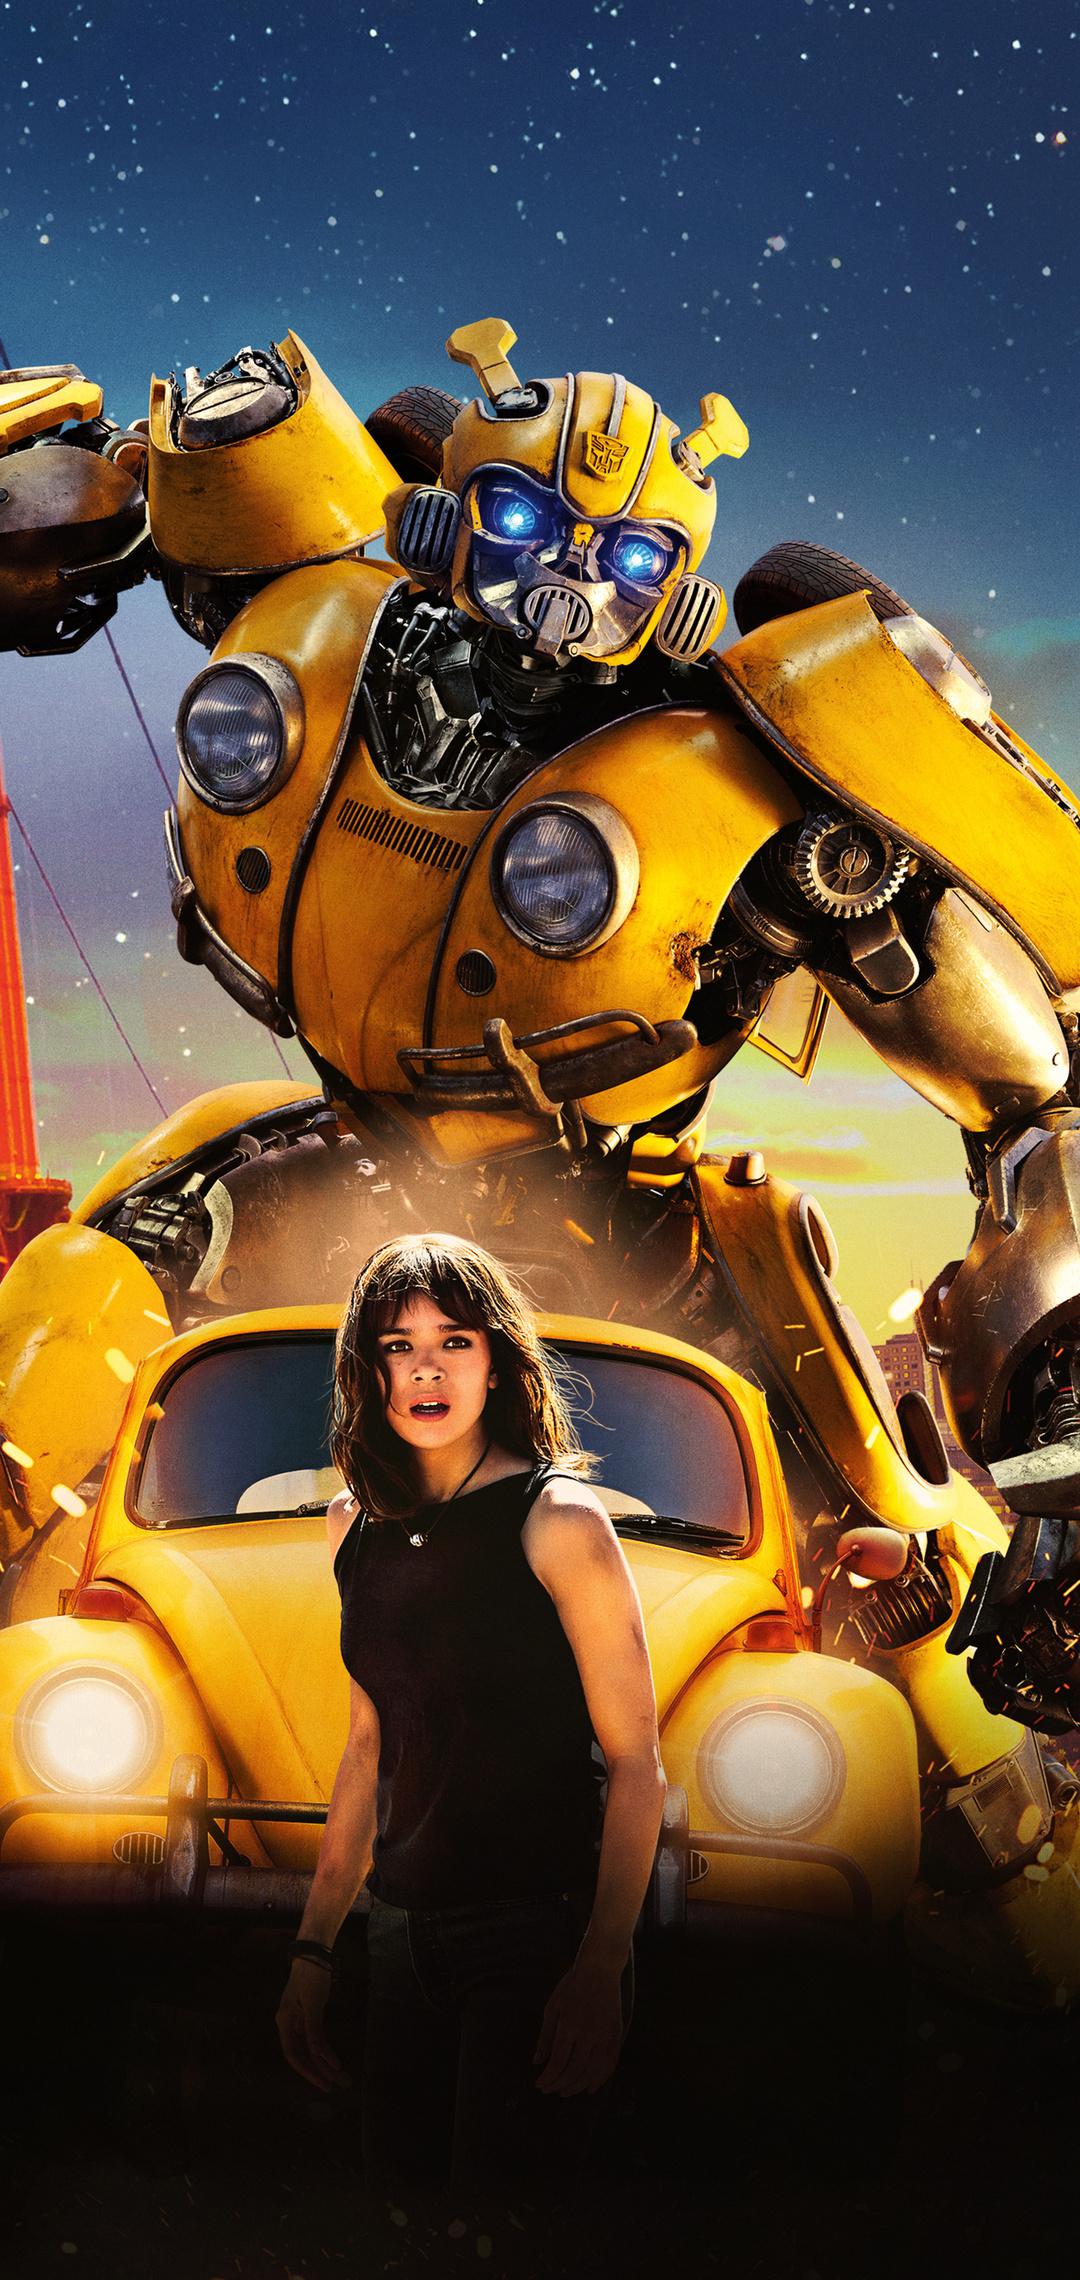 bumblebee-movie-8k-v3.jpg